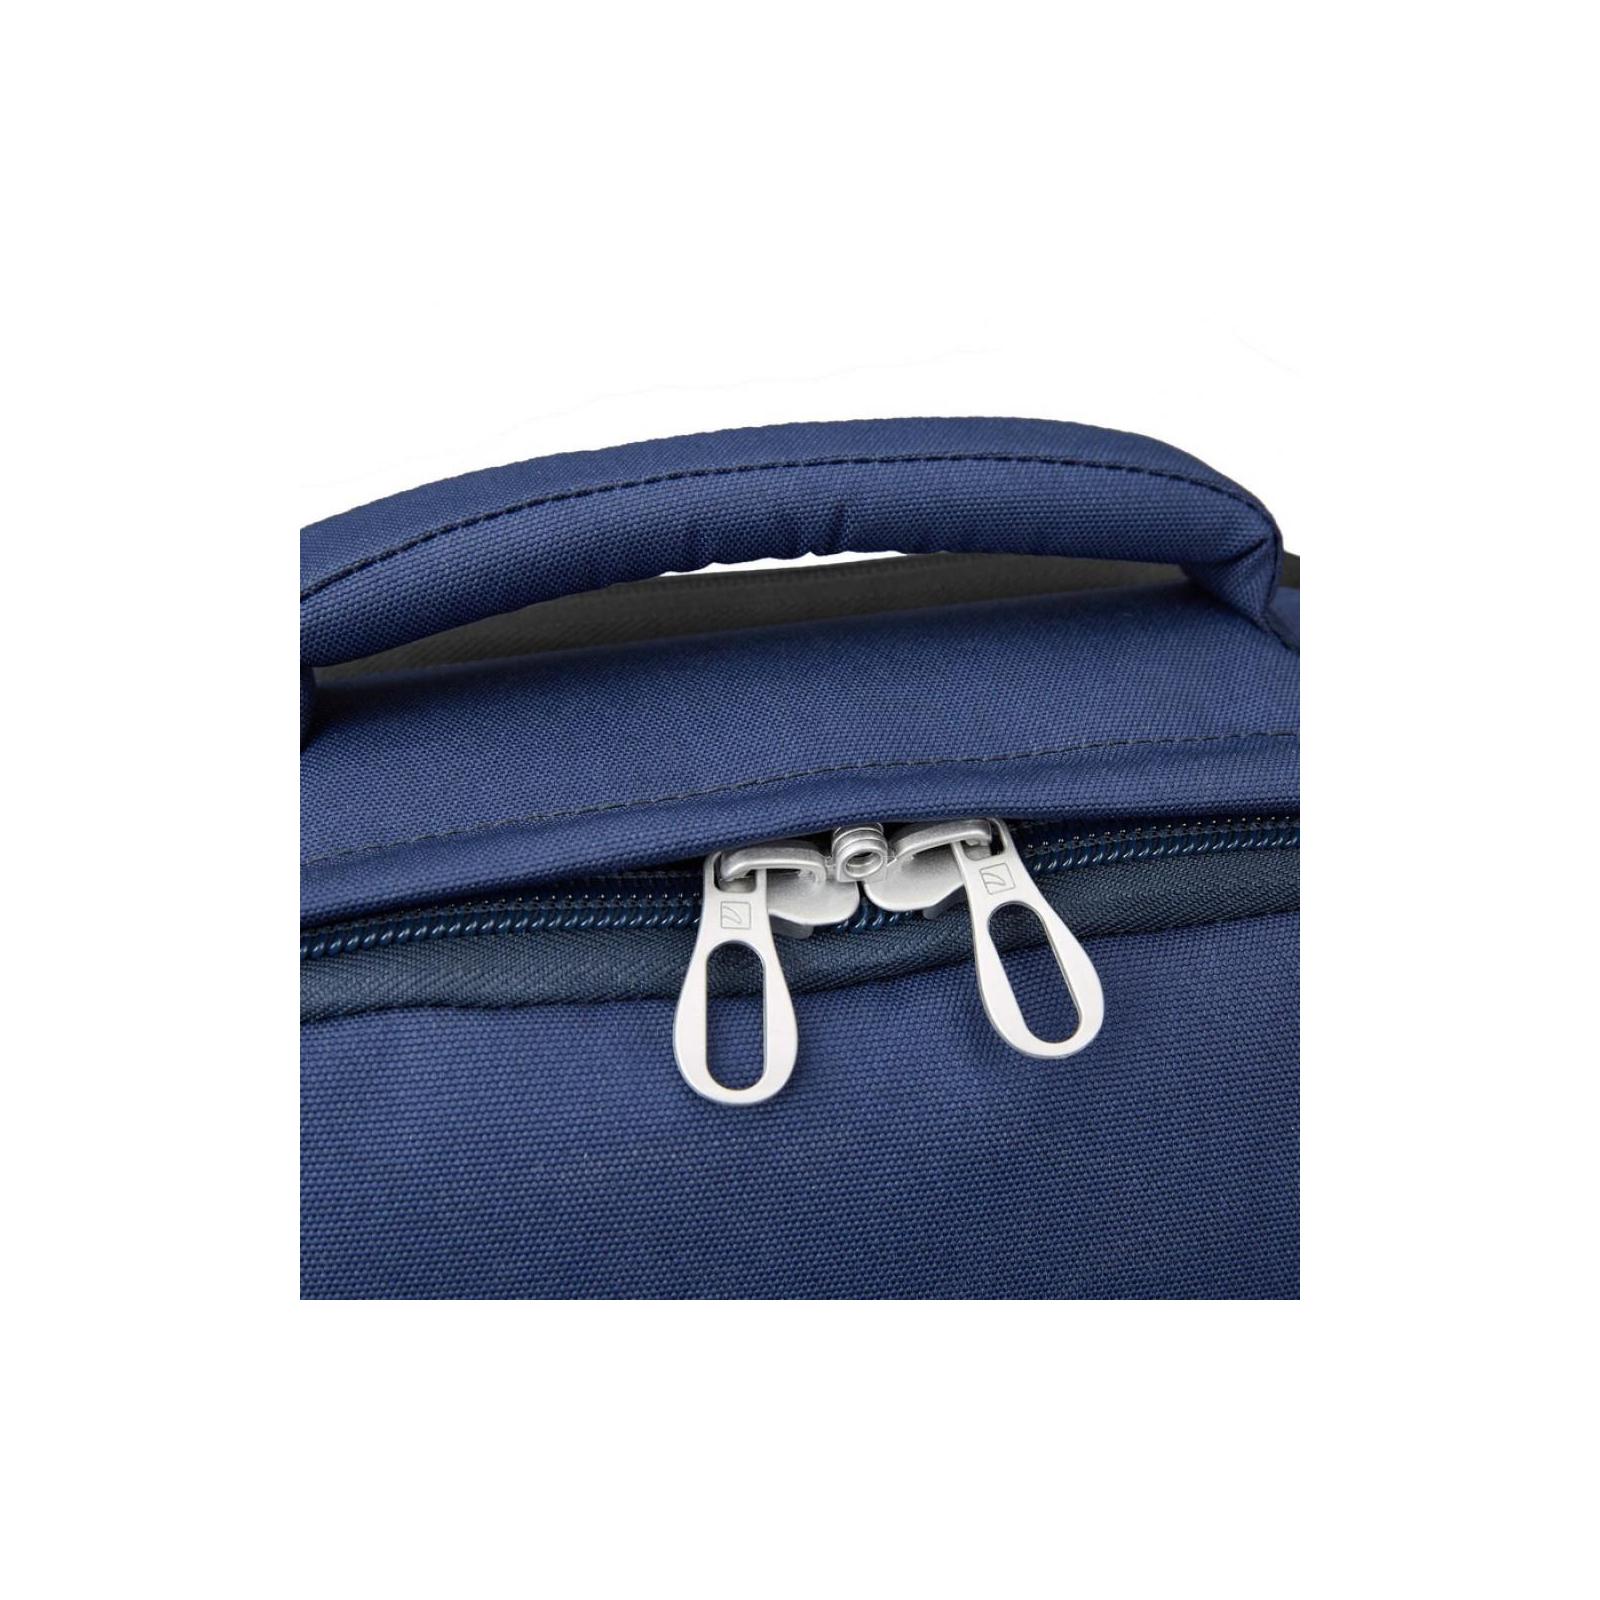 "Рюкзак для ноутбука Tucano 15.6"" TUGO' M CABIN blue (BKTUG-M-B) изображение 6"